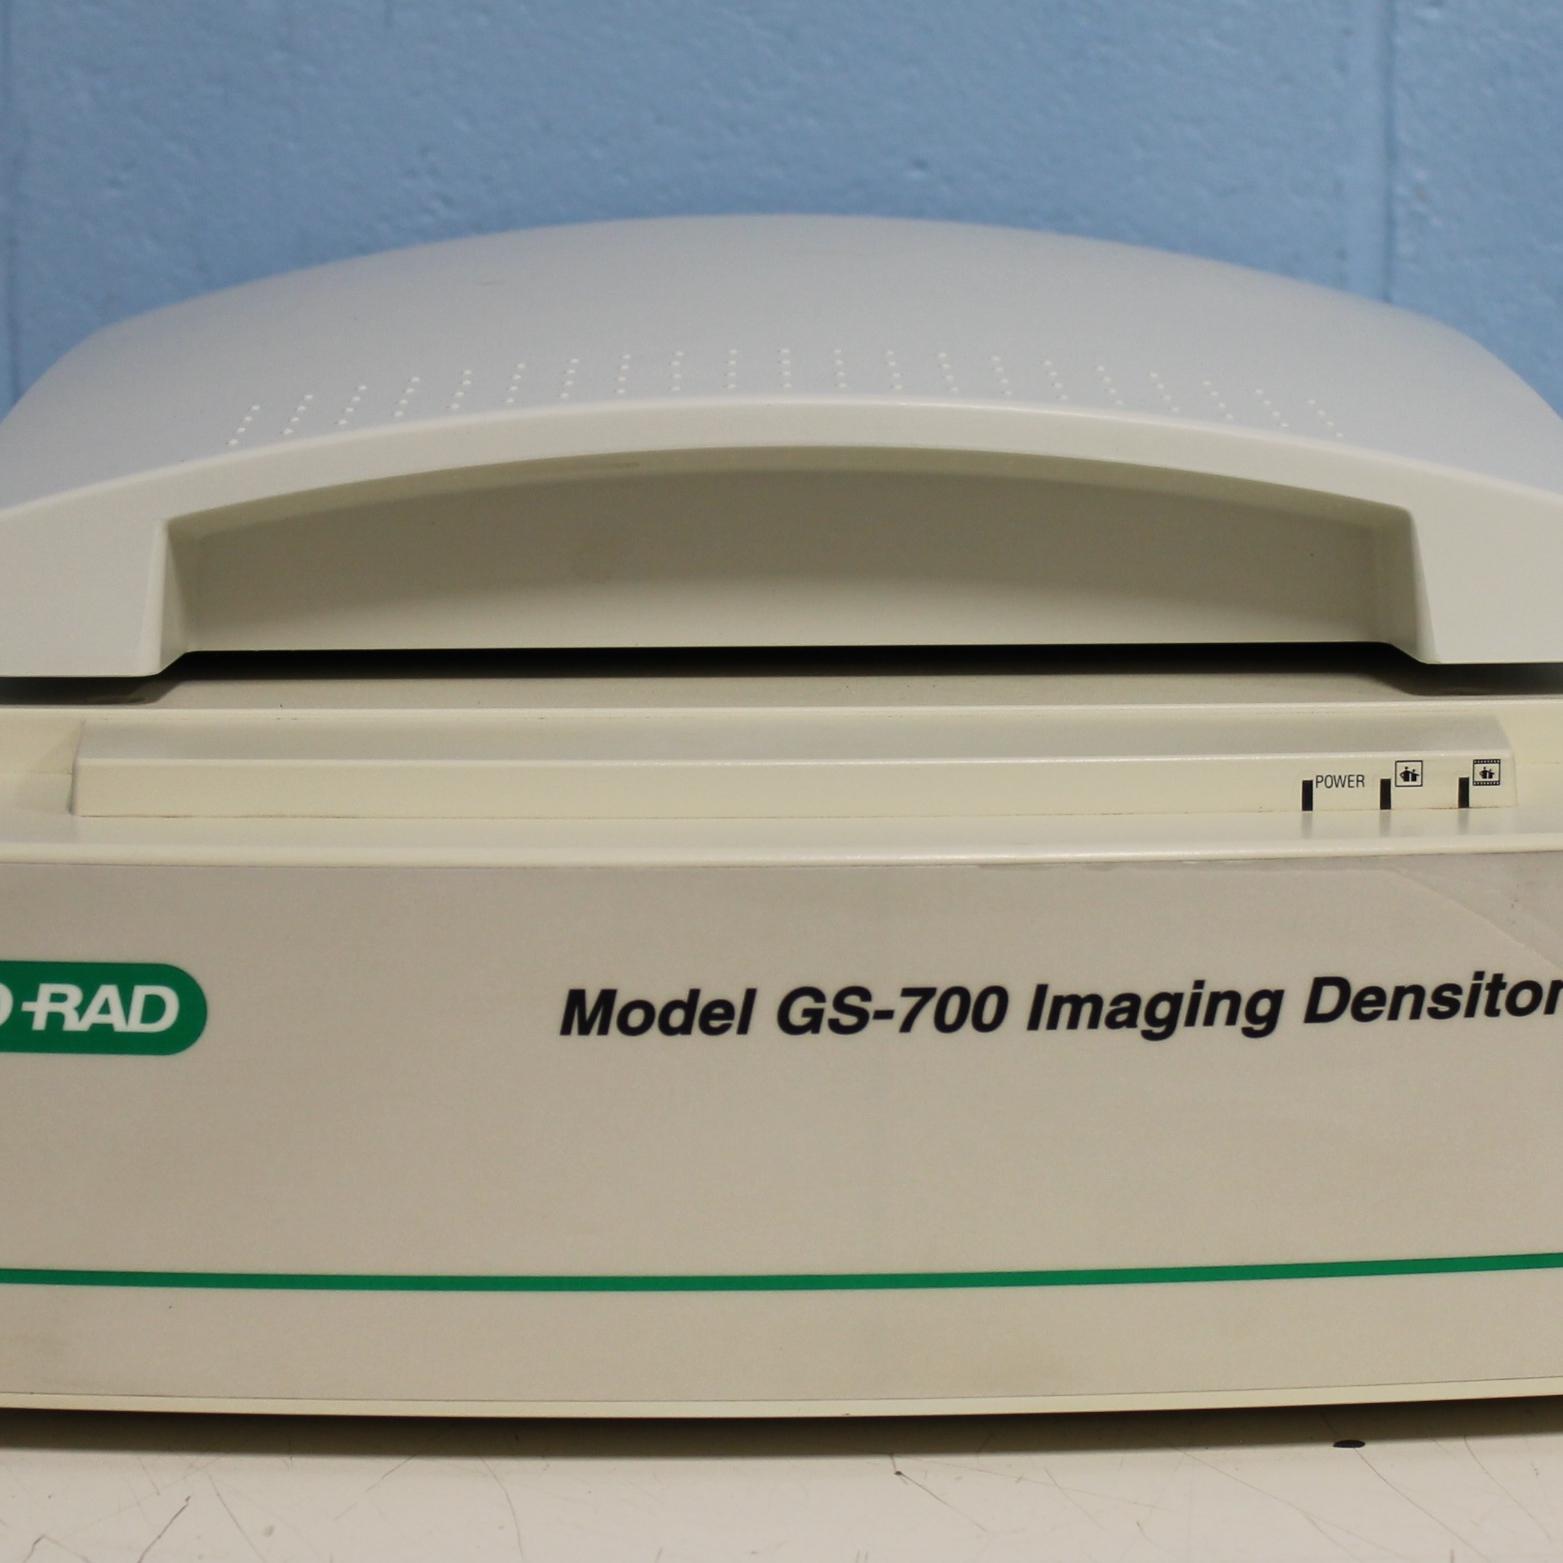 Model GS-700 Imaging Densitometer